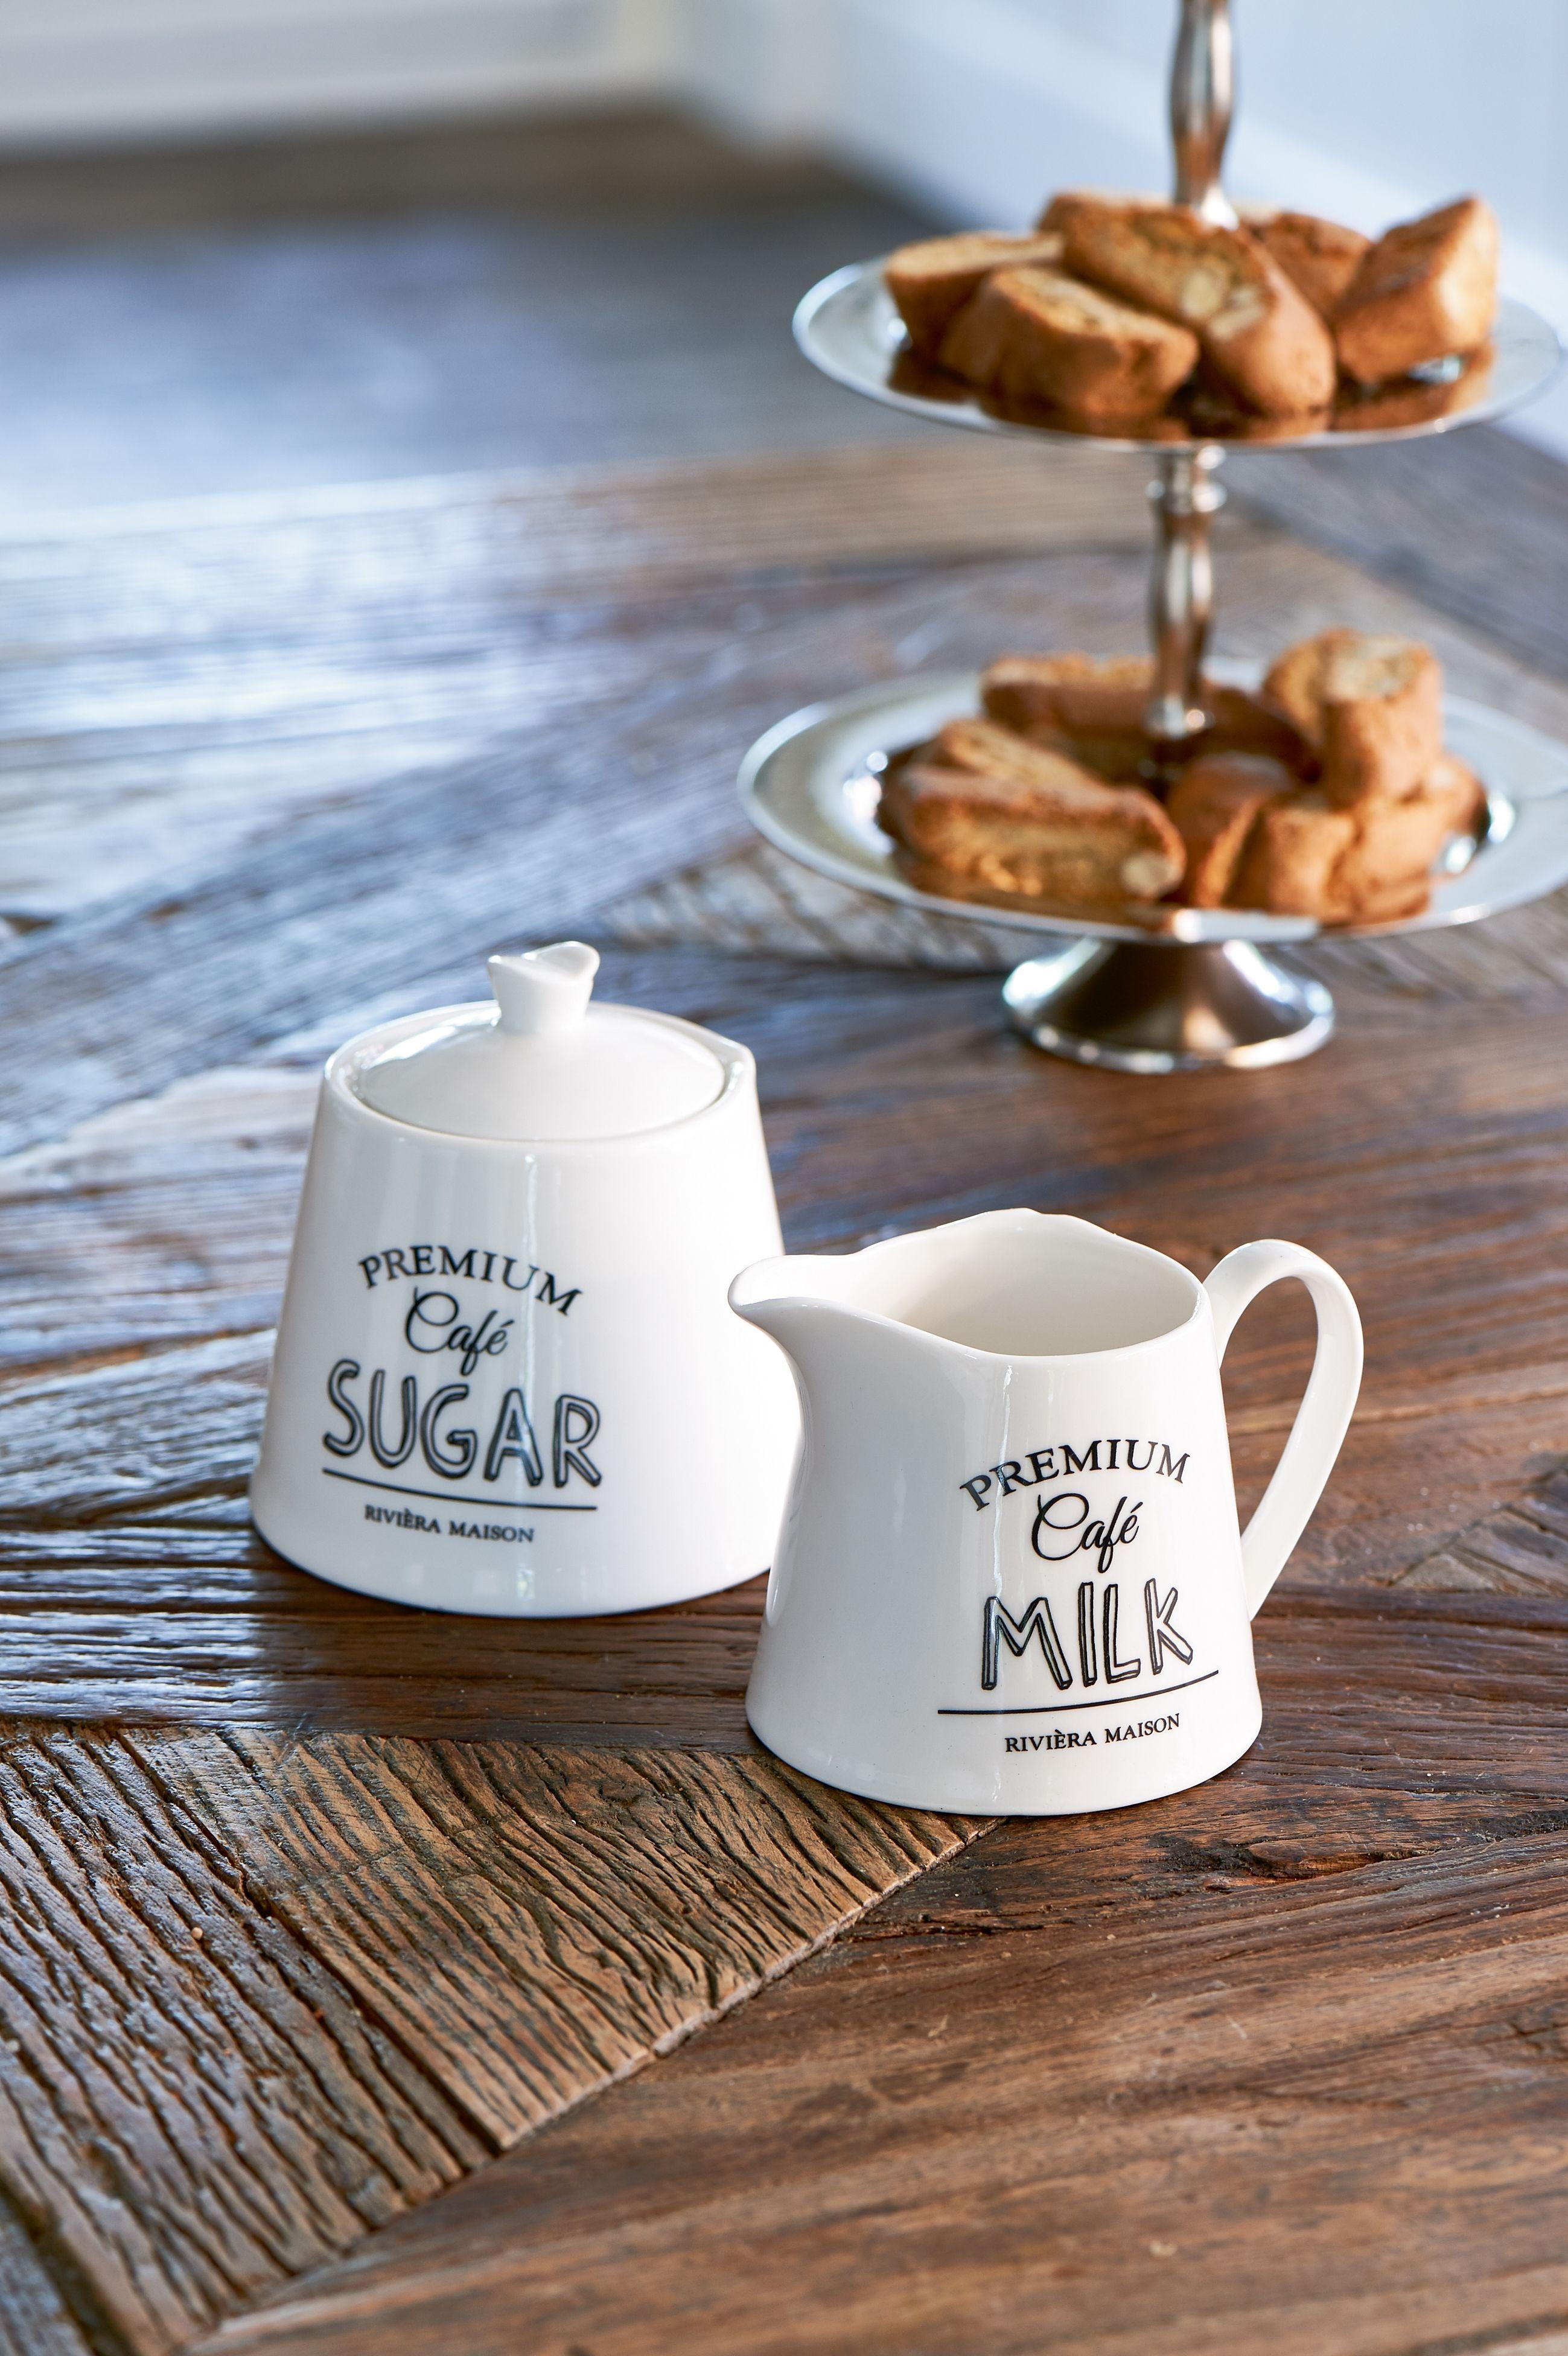 Sada Premium Café Sugar & Milk